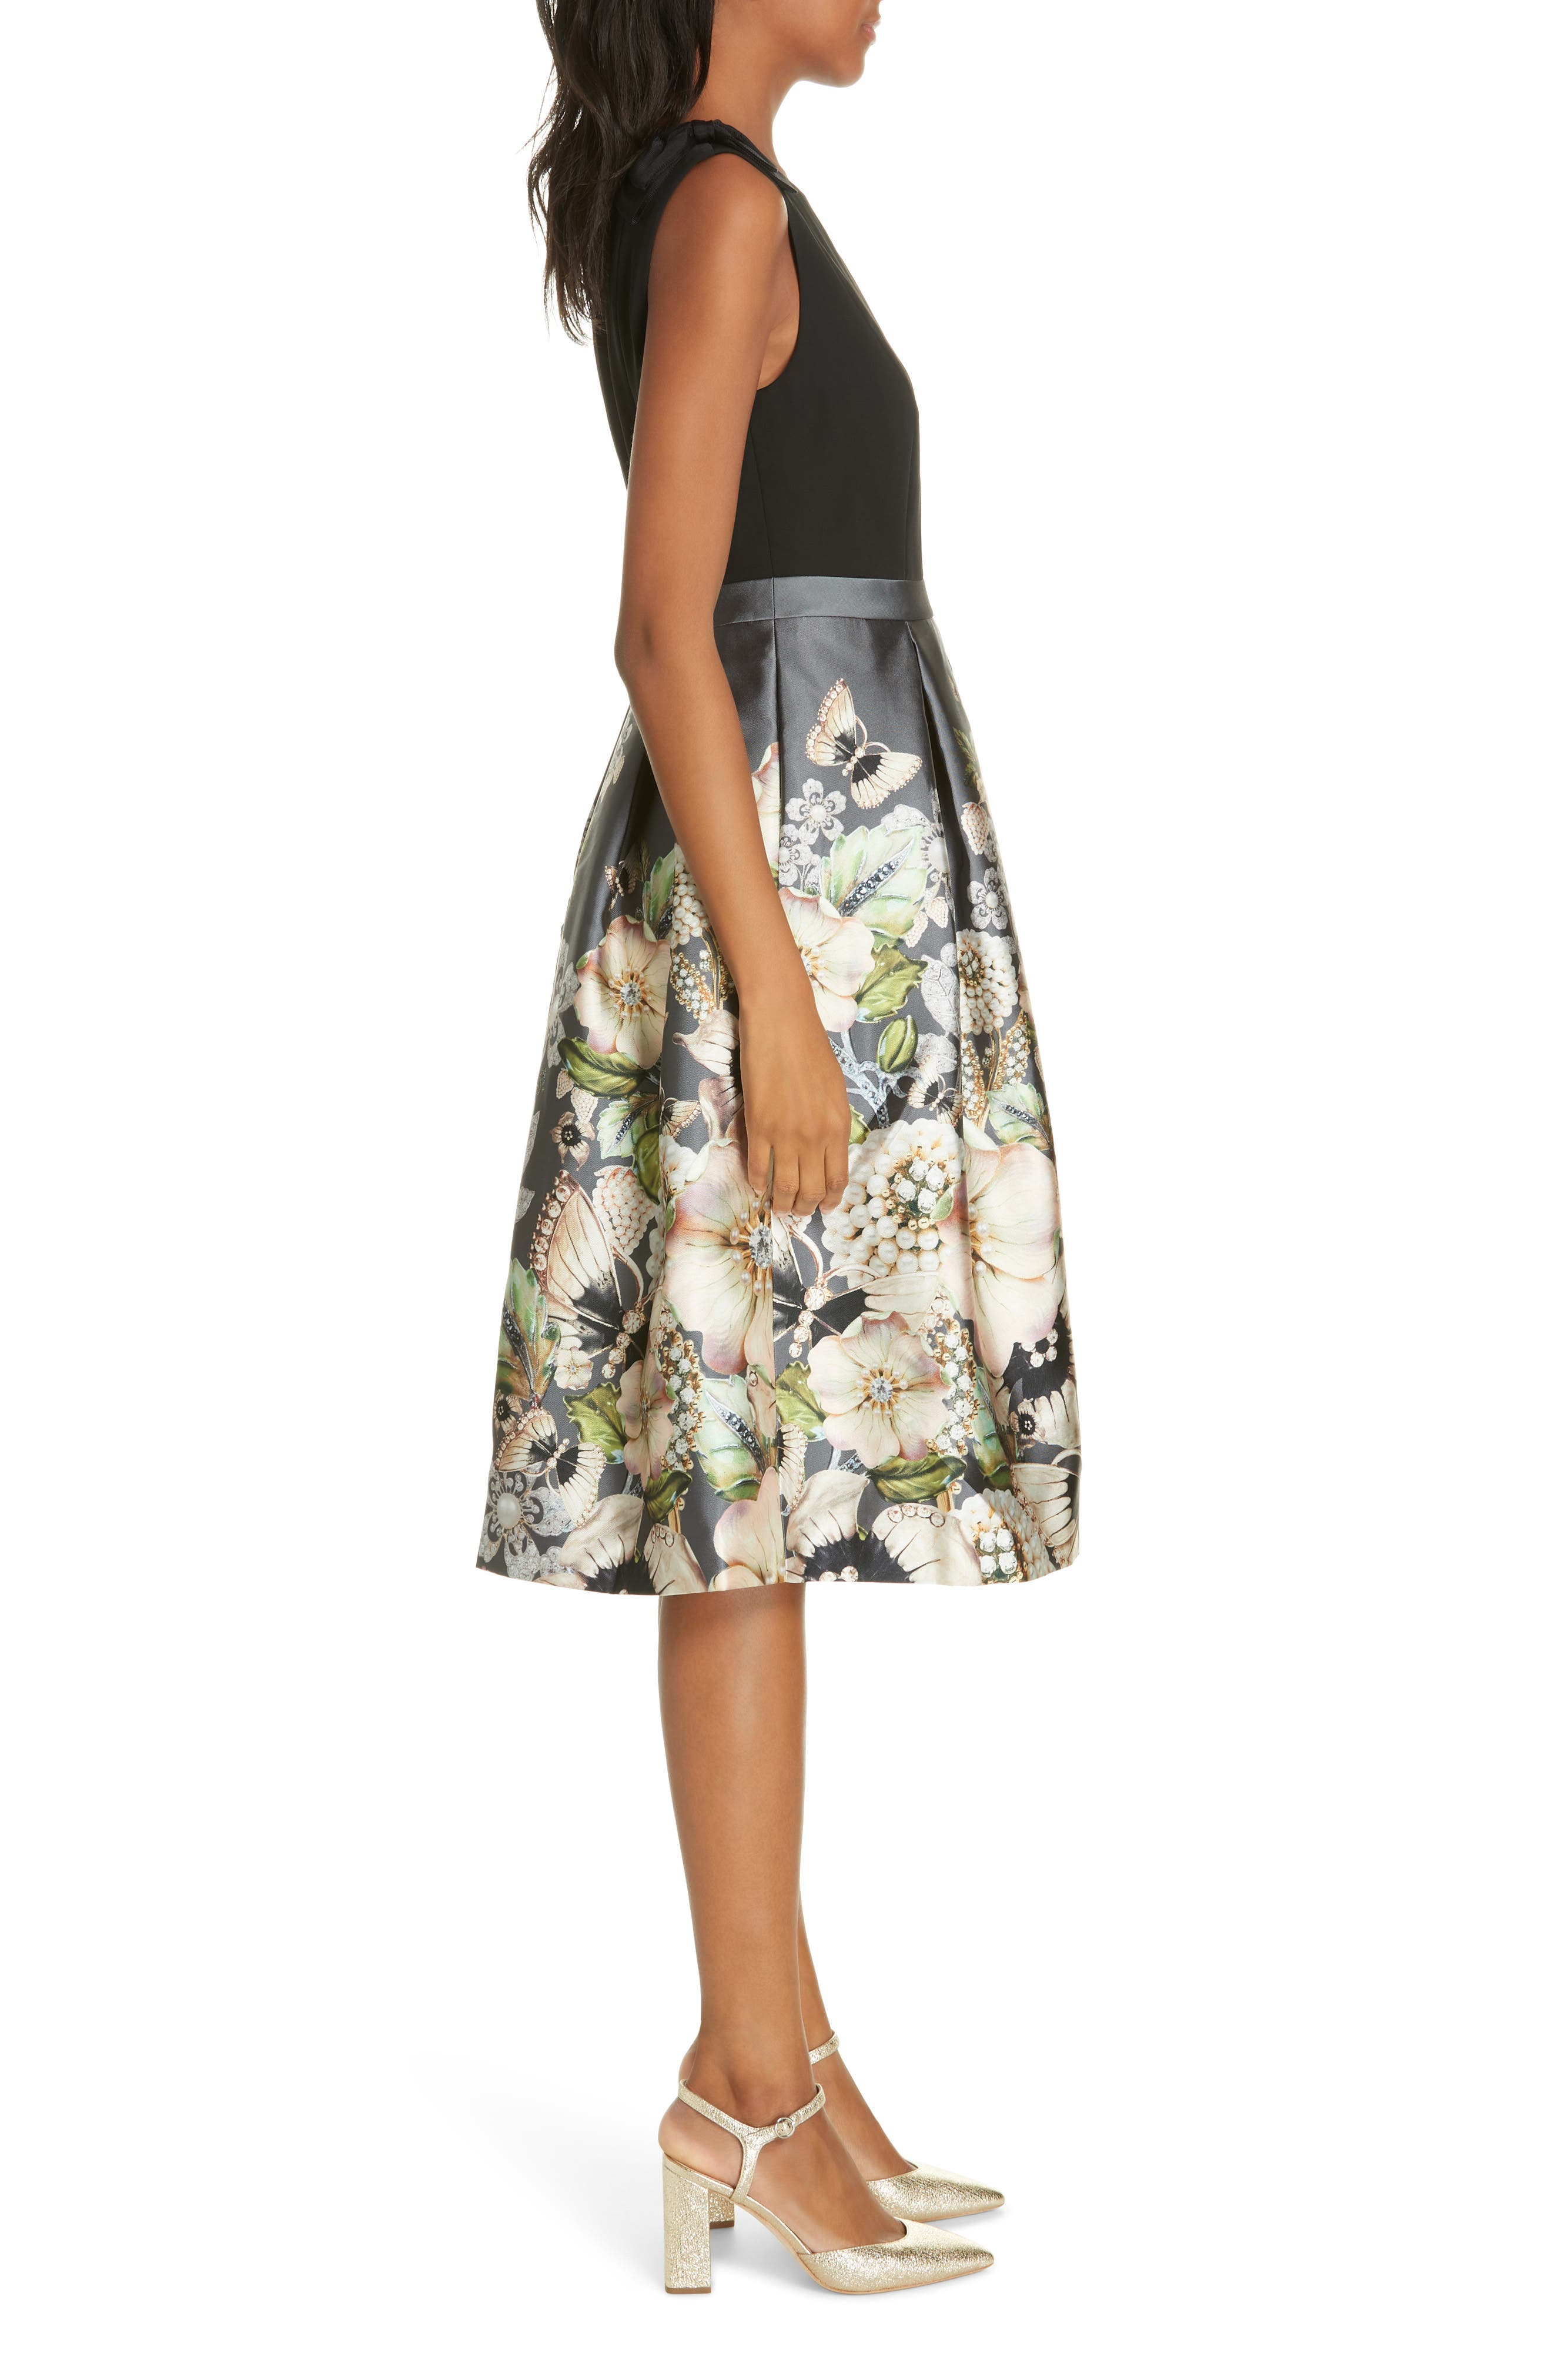 Molyka Gem Gardens Bow Dress,                             Alternate thumbnail 3, color,                             CHARCOAL